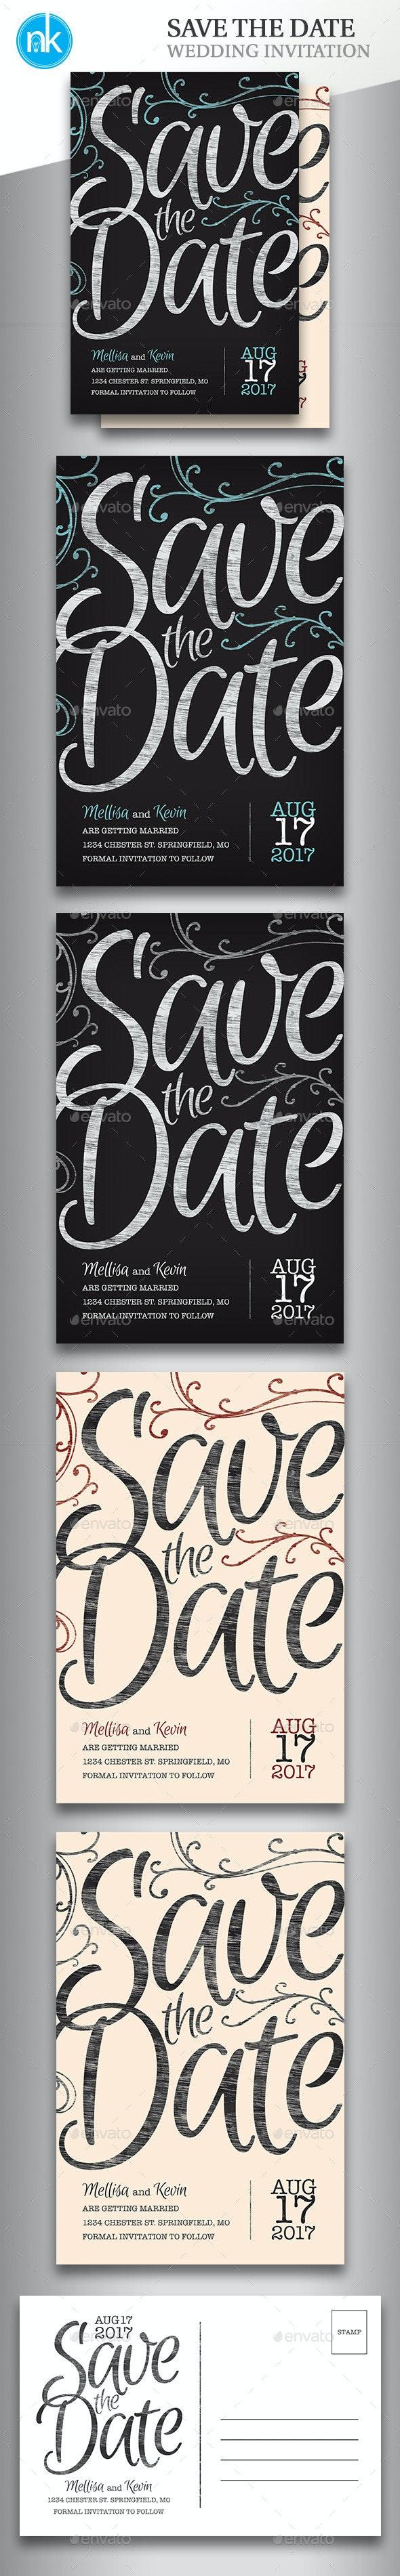 Save The Date Postcard - Chalkboard / Vintage - Weddings Cards & Invites